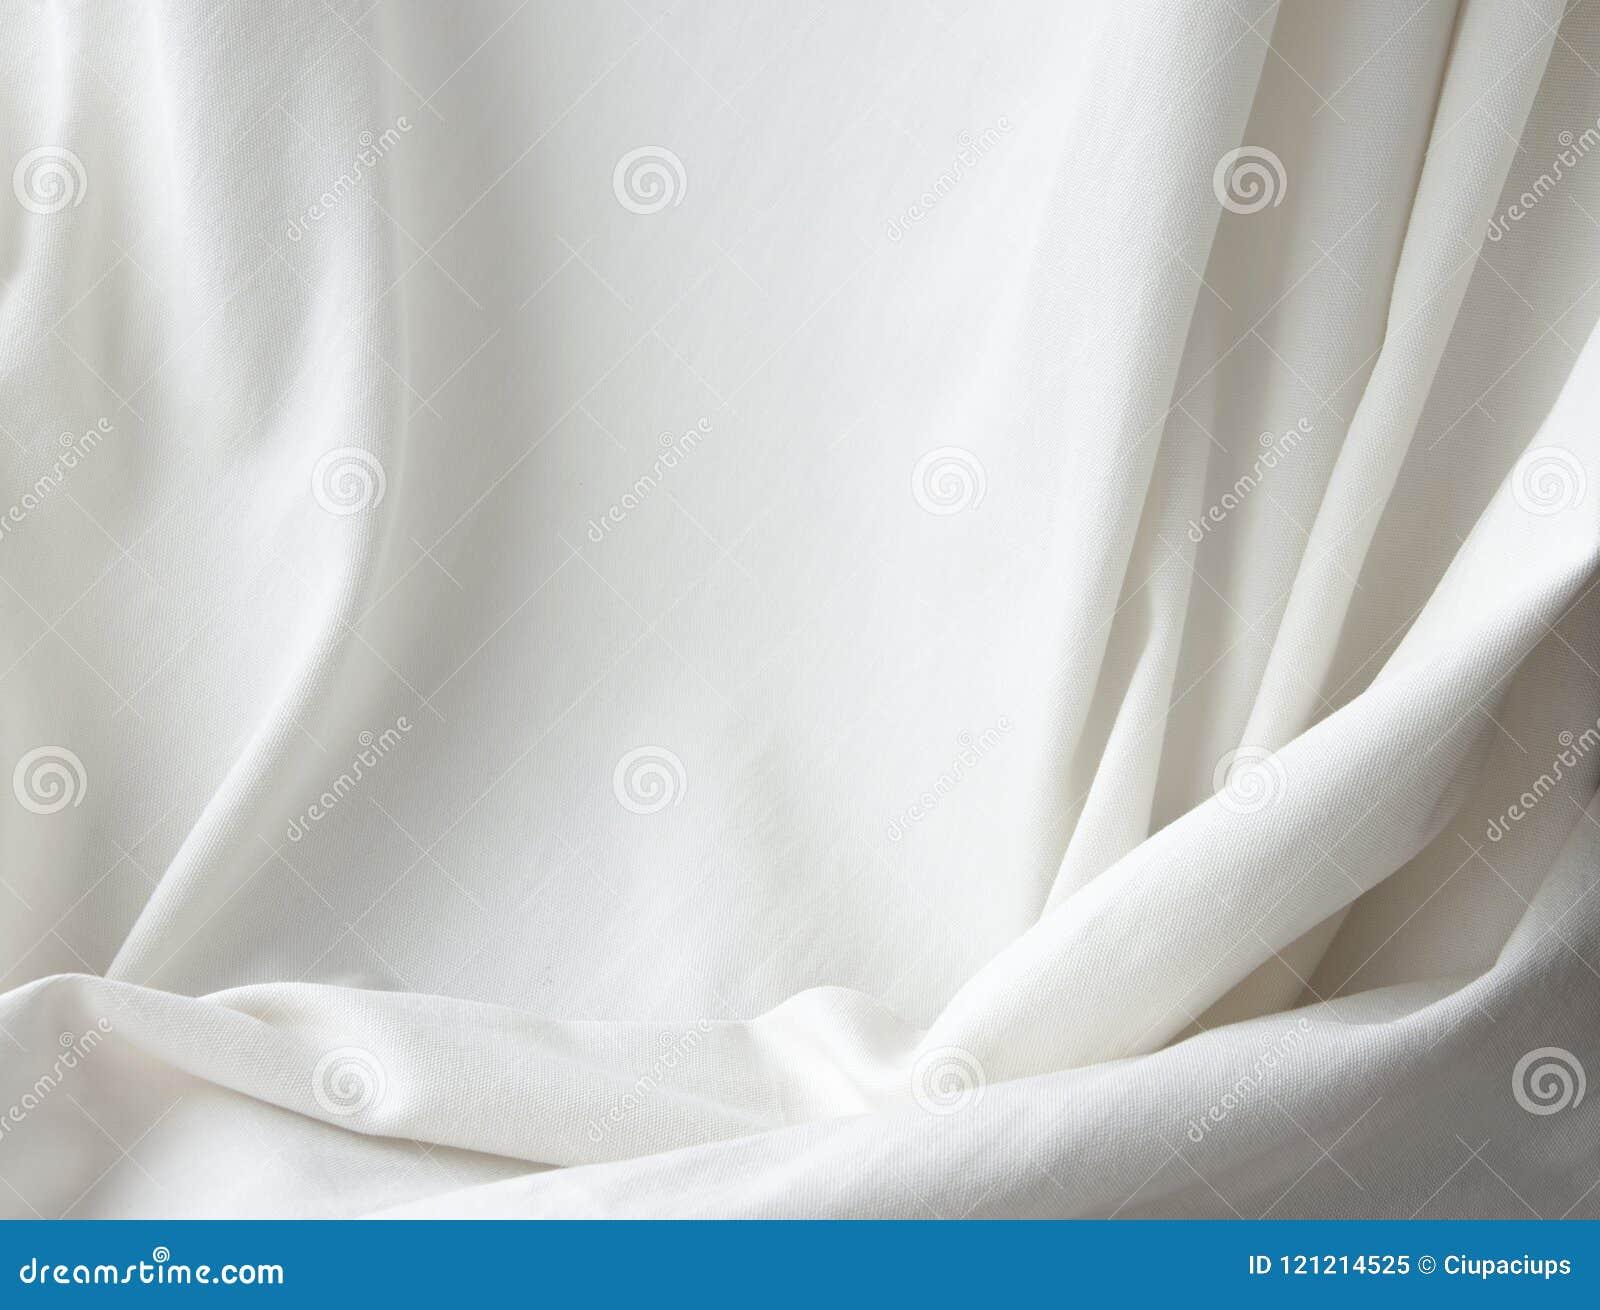 Белая элегантная предпосылка drapery текстуры брезентовой парусины